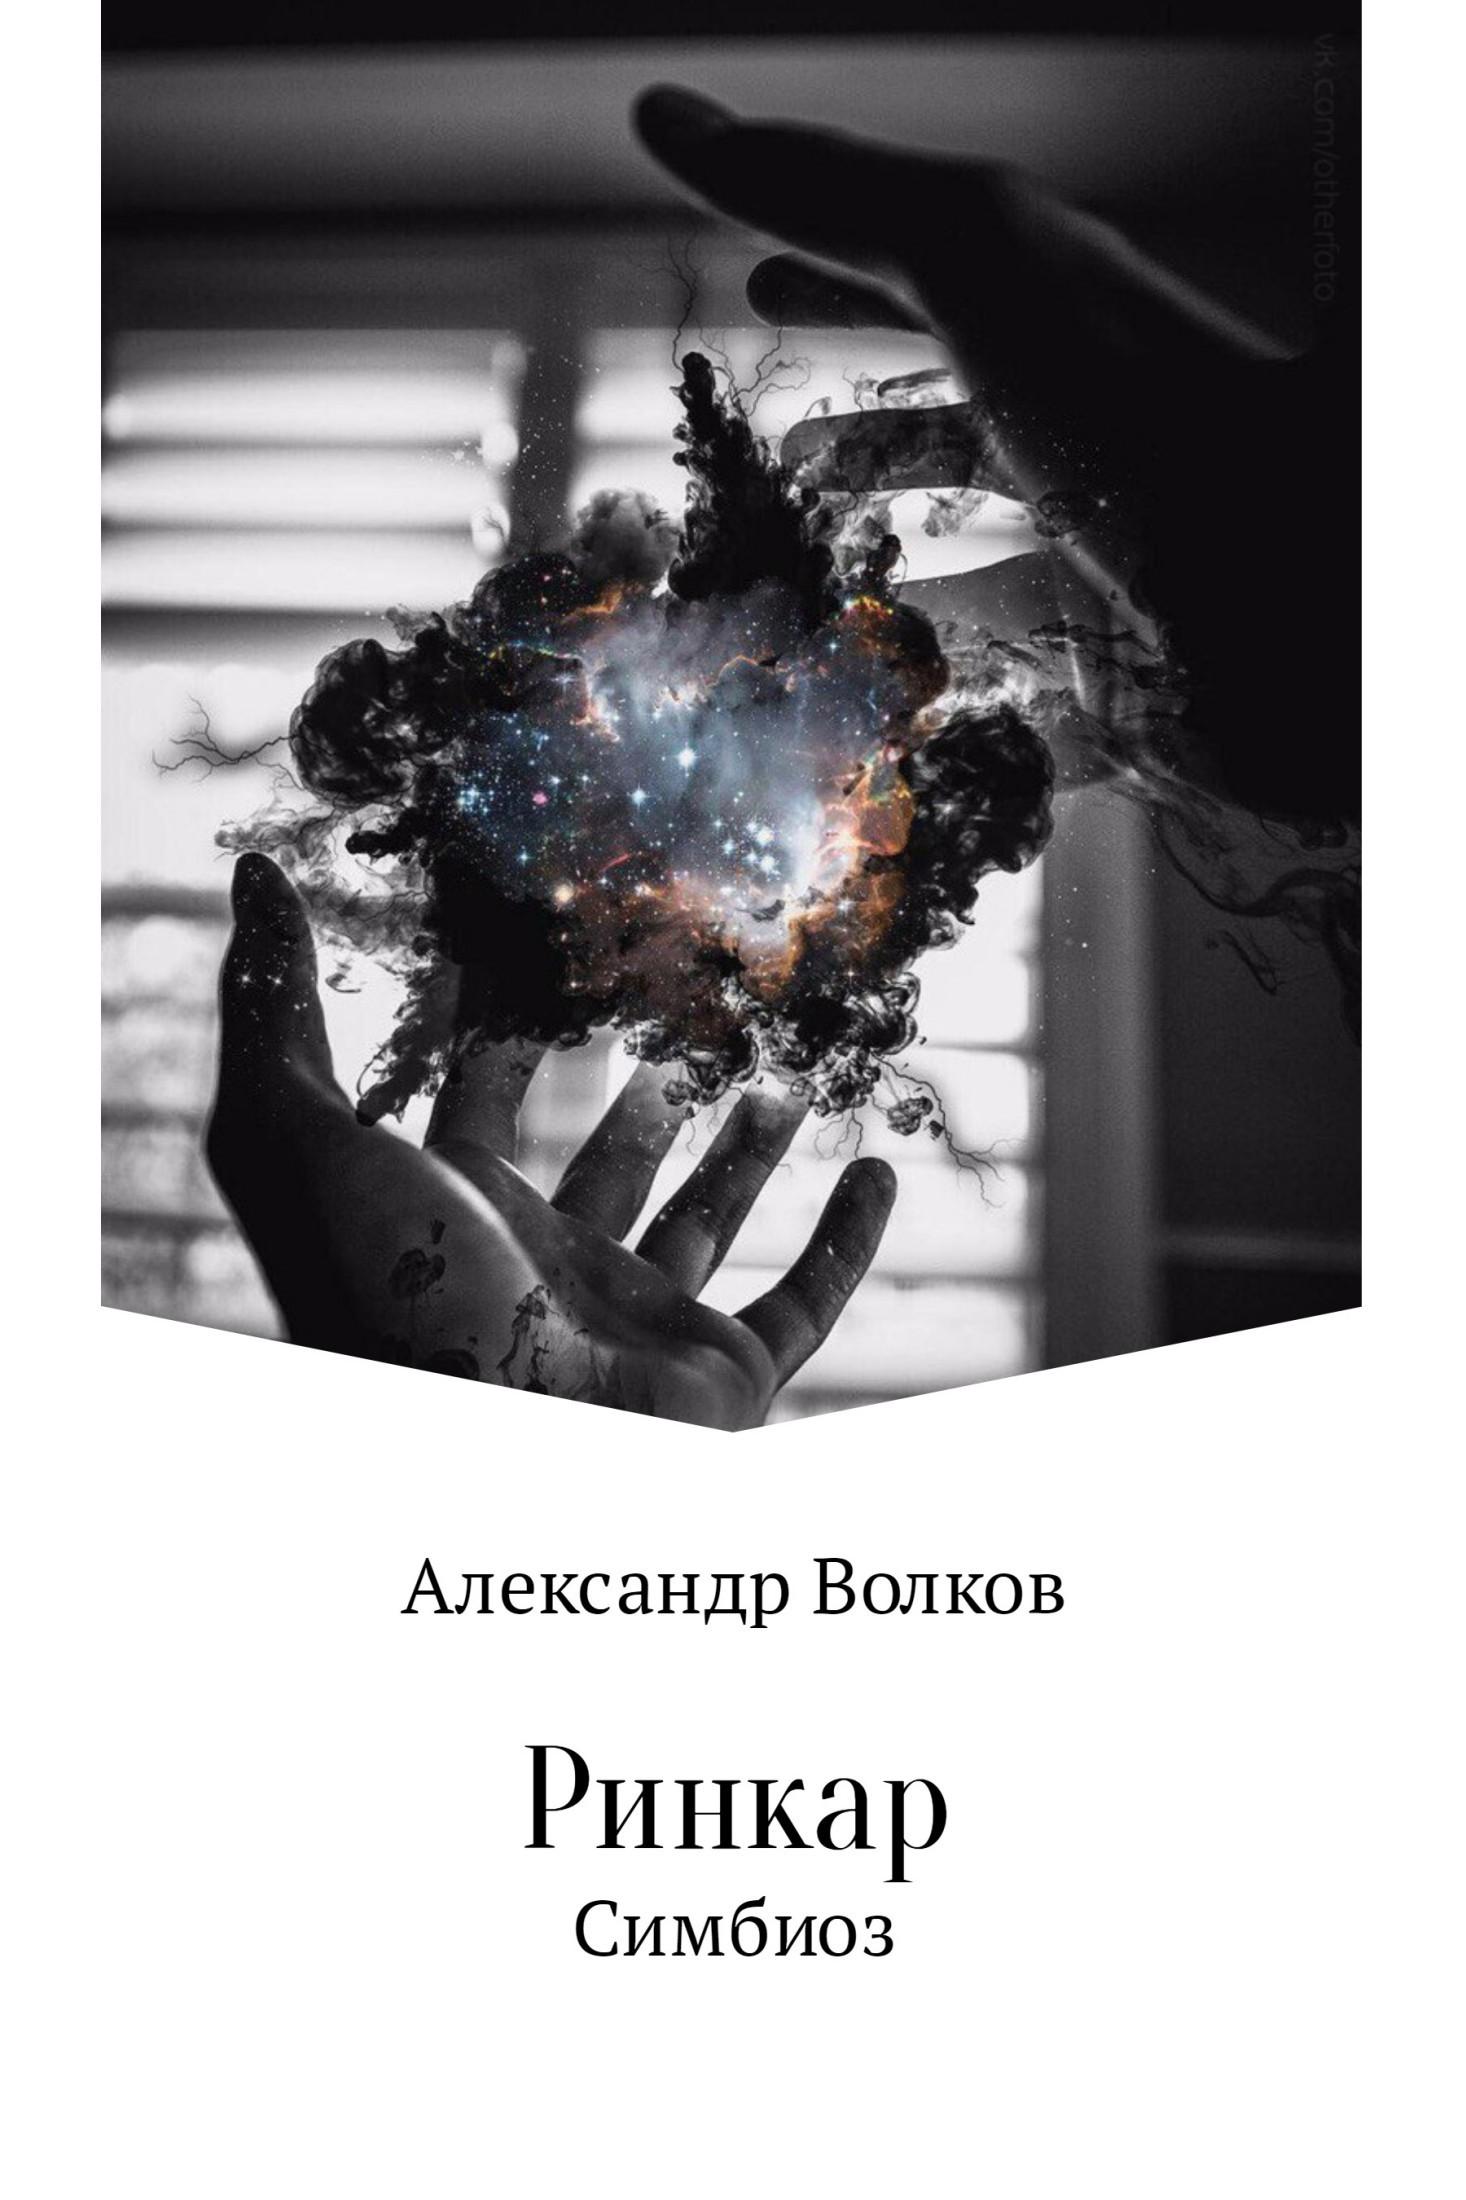 Александр Волков - Ринкар. Симбиоз